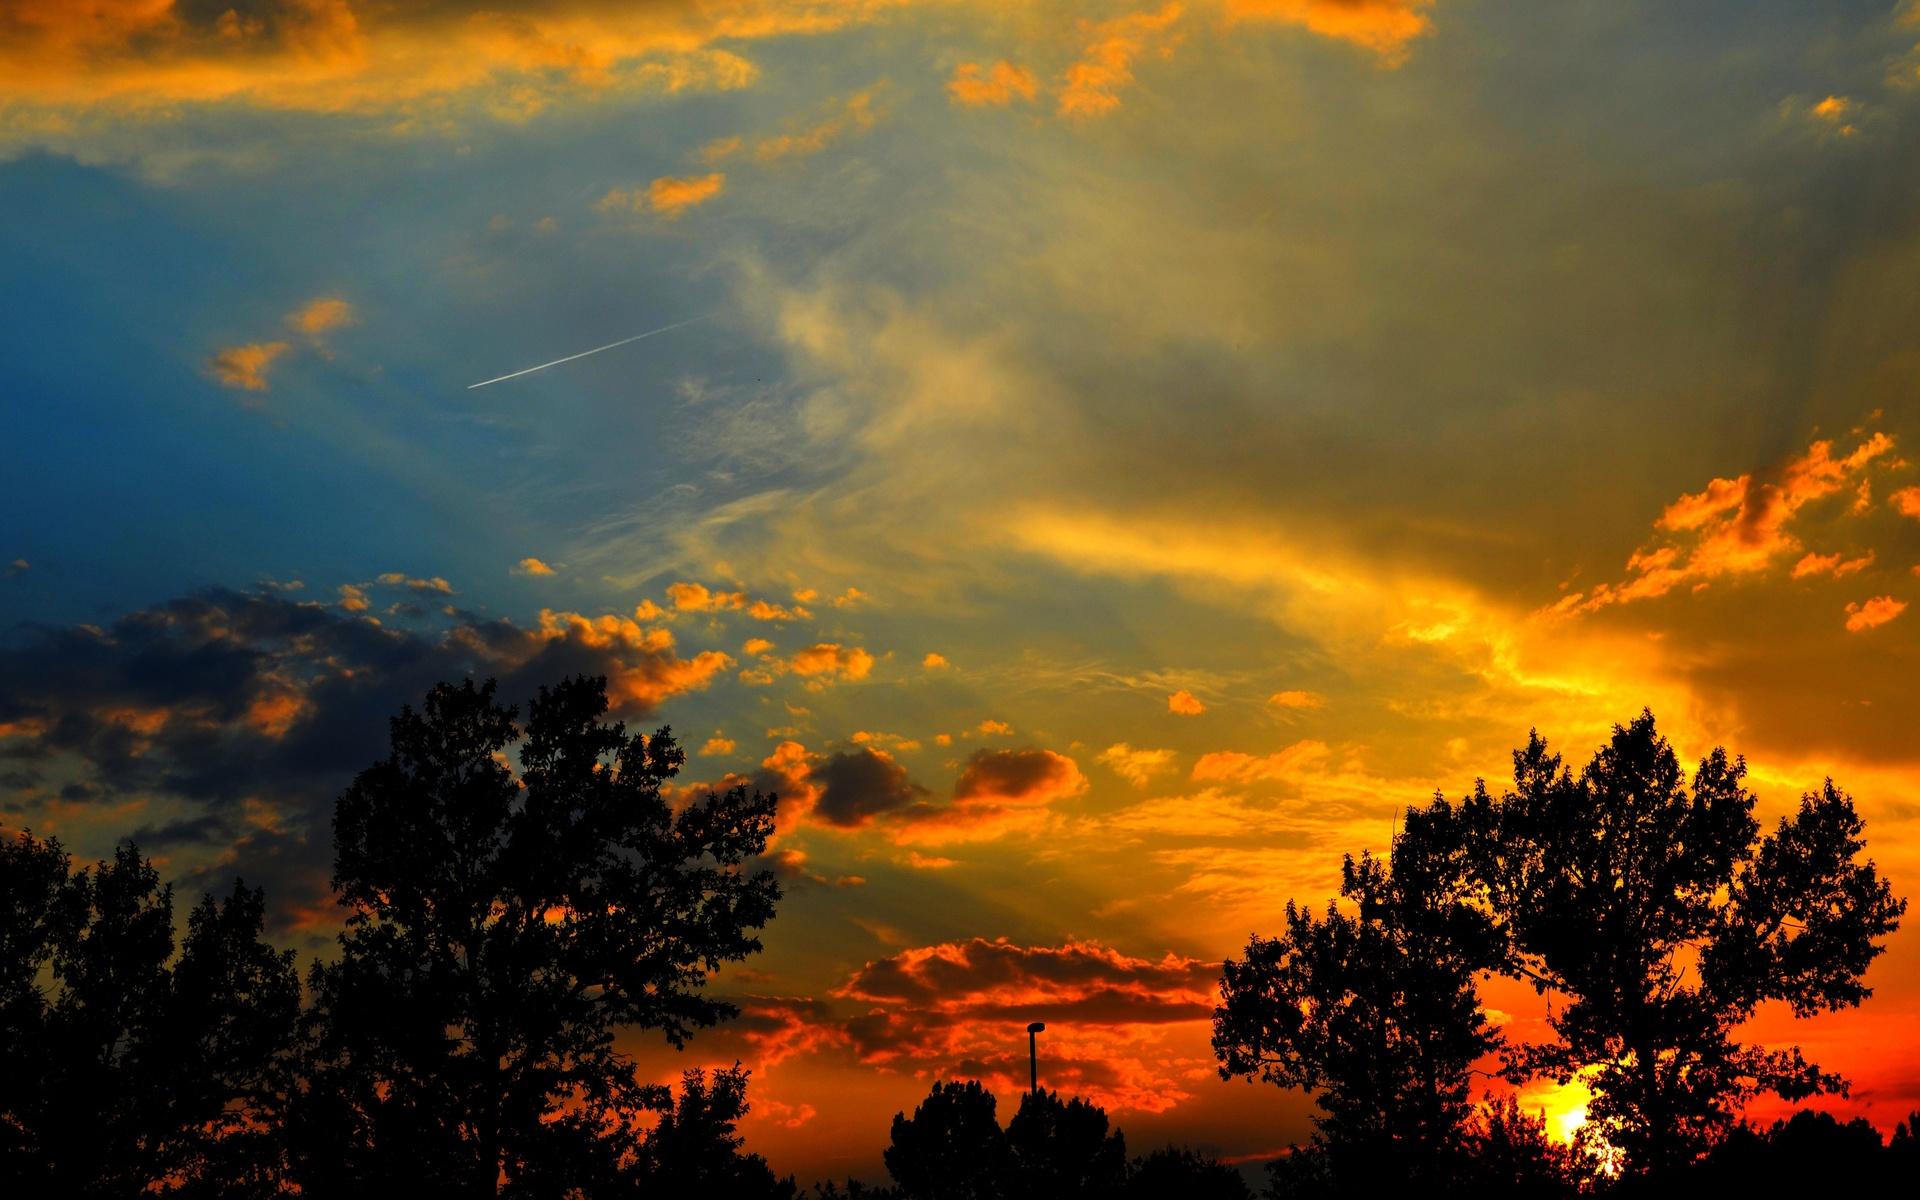 sunset silhouette nature